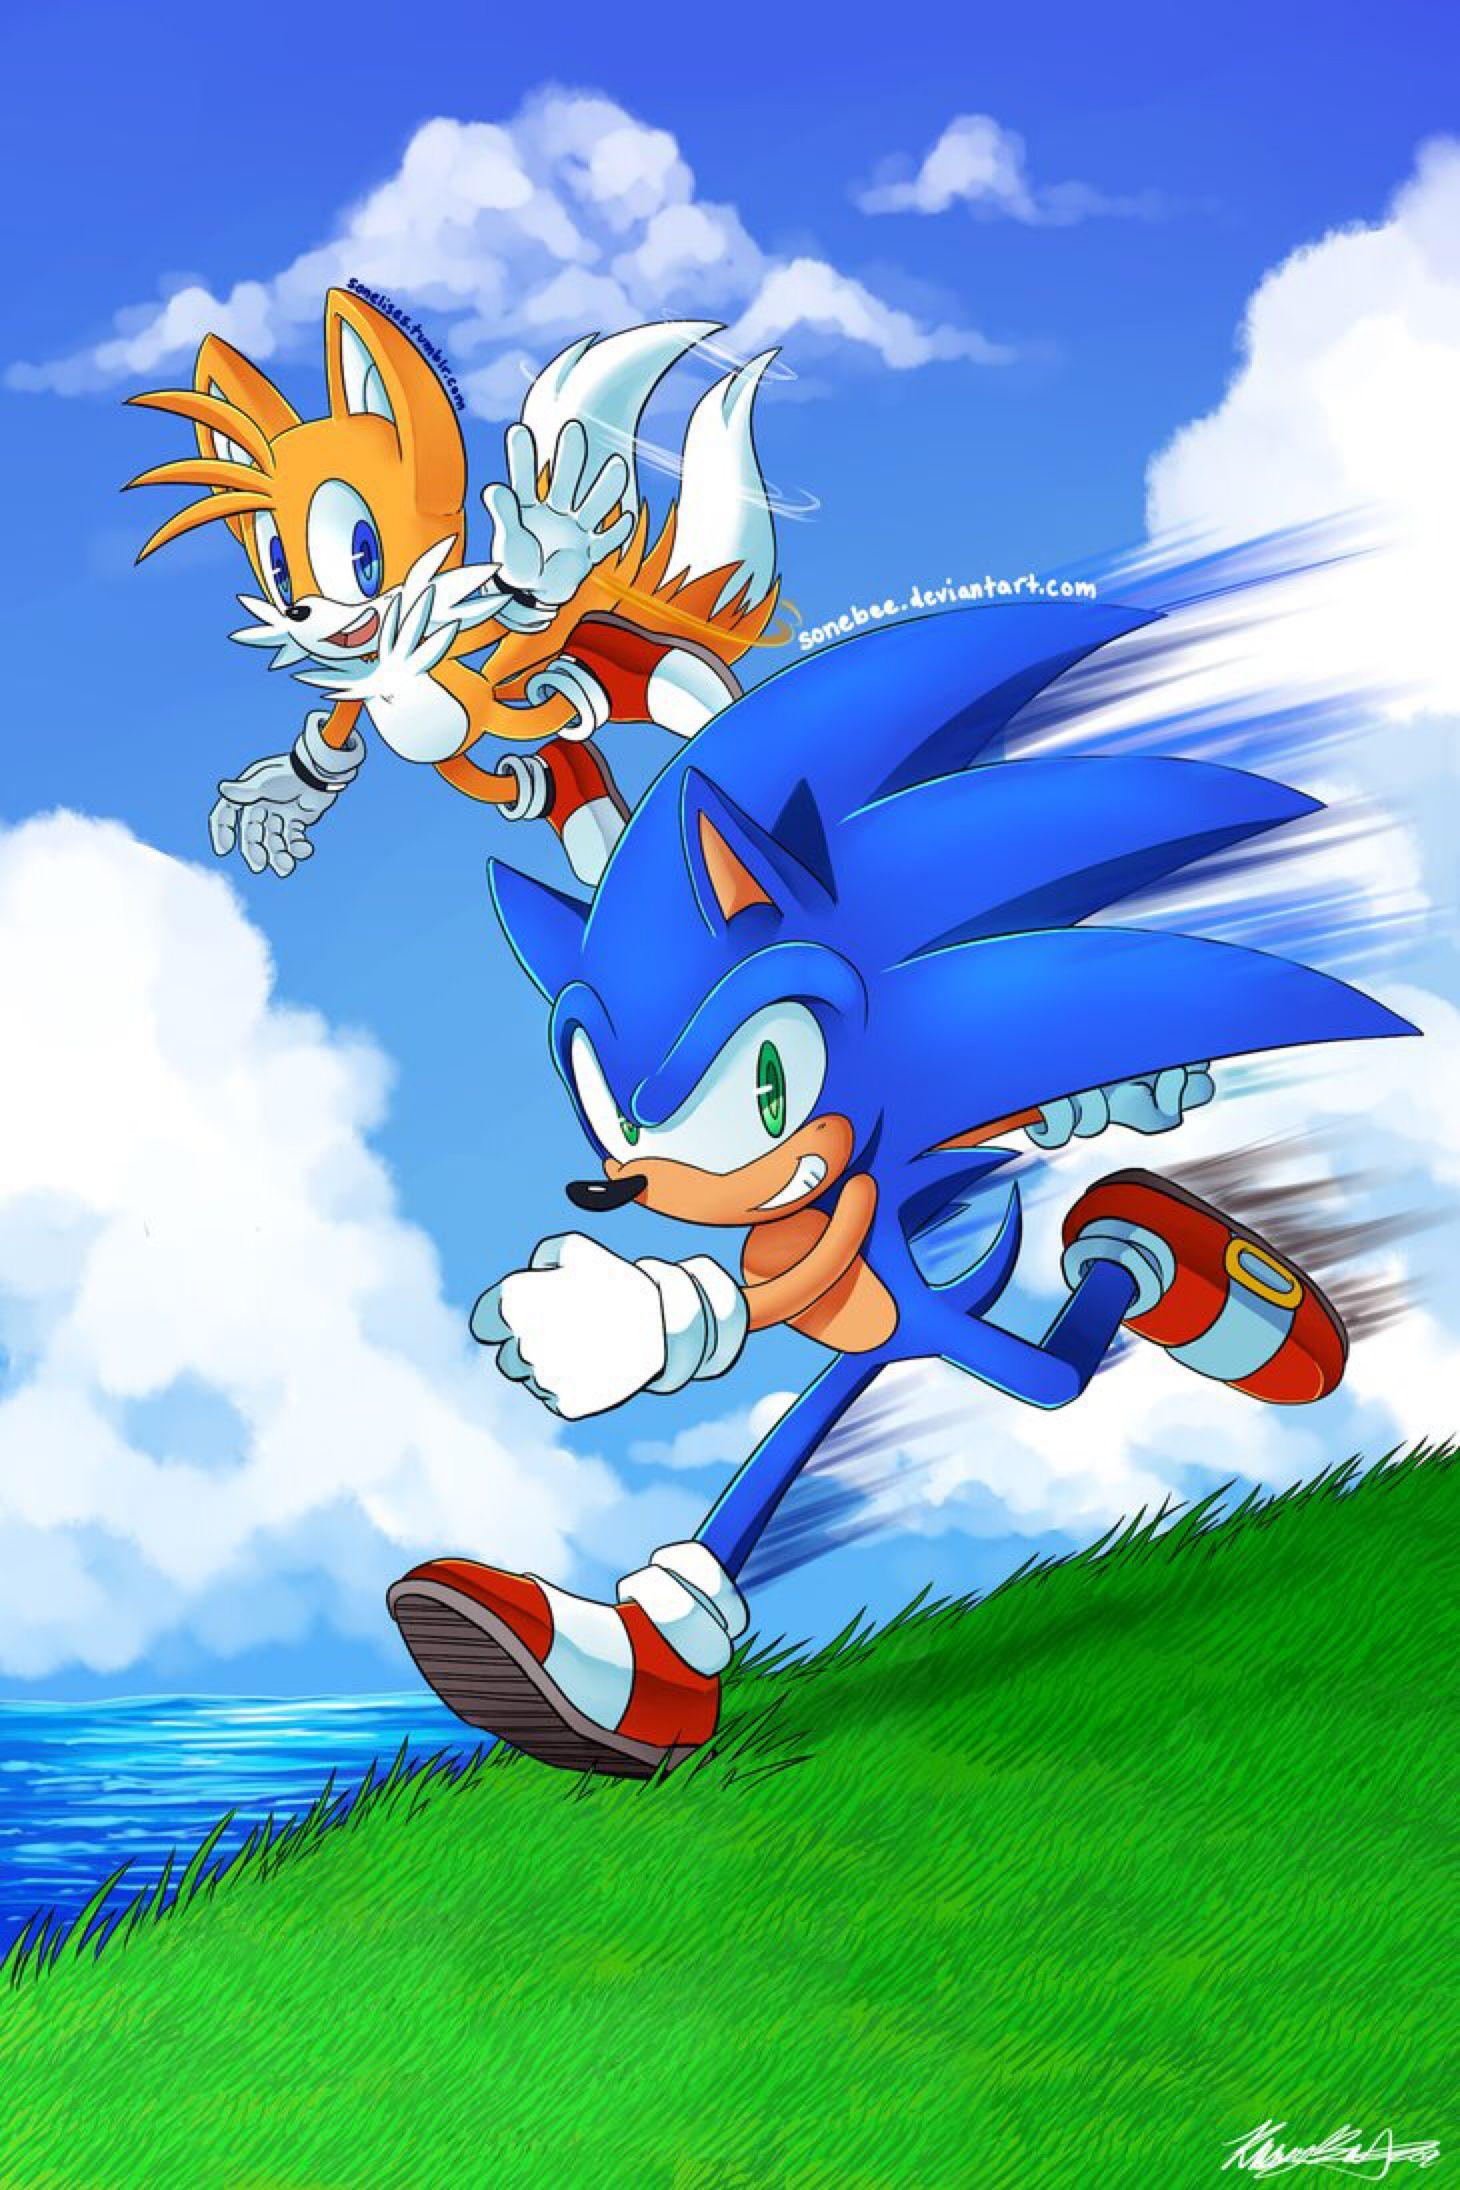 We Ll Run Away Old 2015 By Sonebee On Deviantart Sonic The Hedgehog Hedgehog Art Classic Sonic